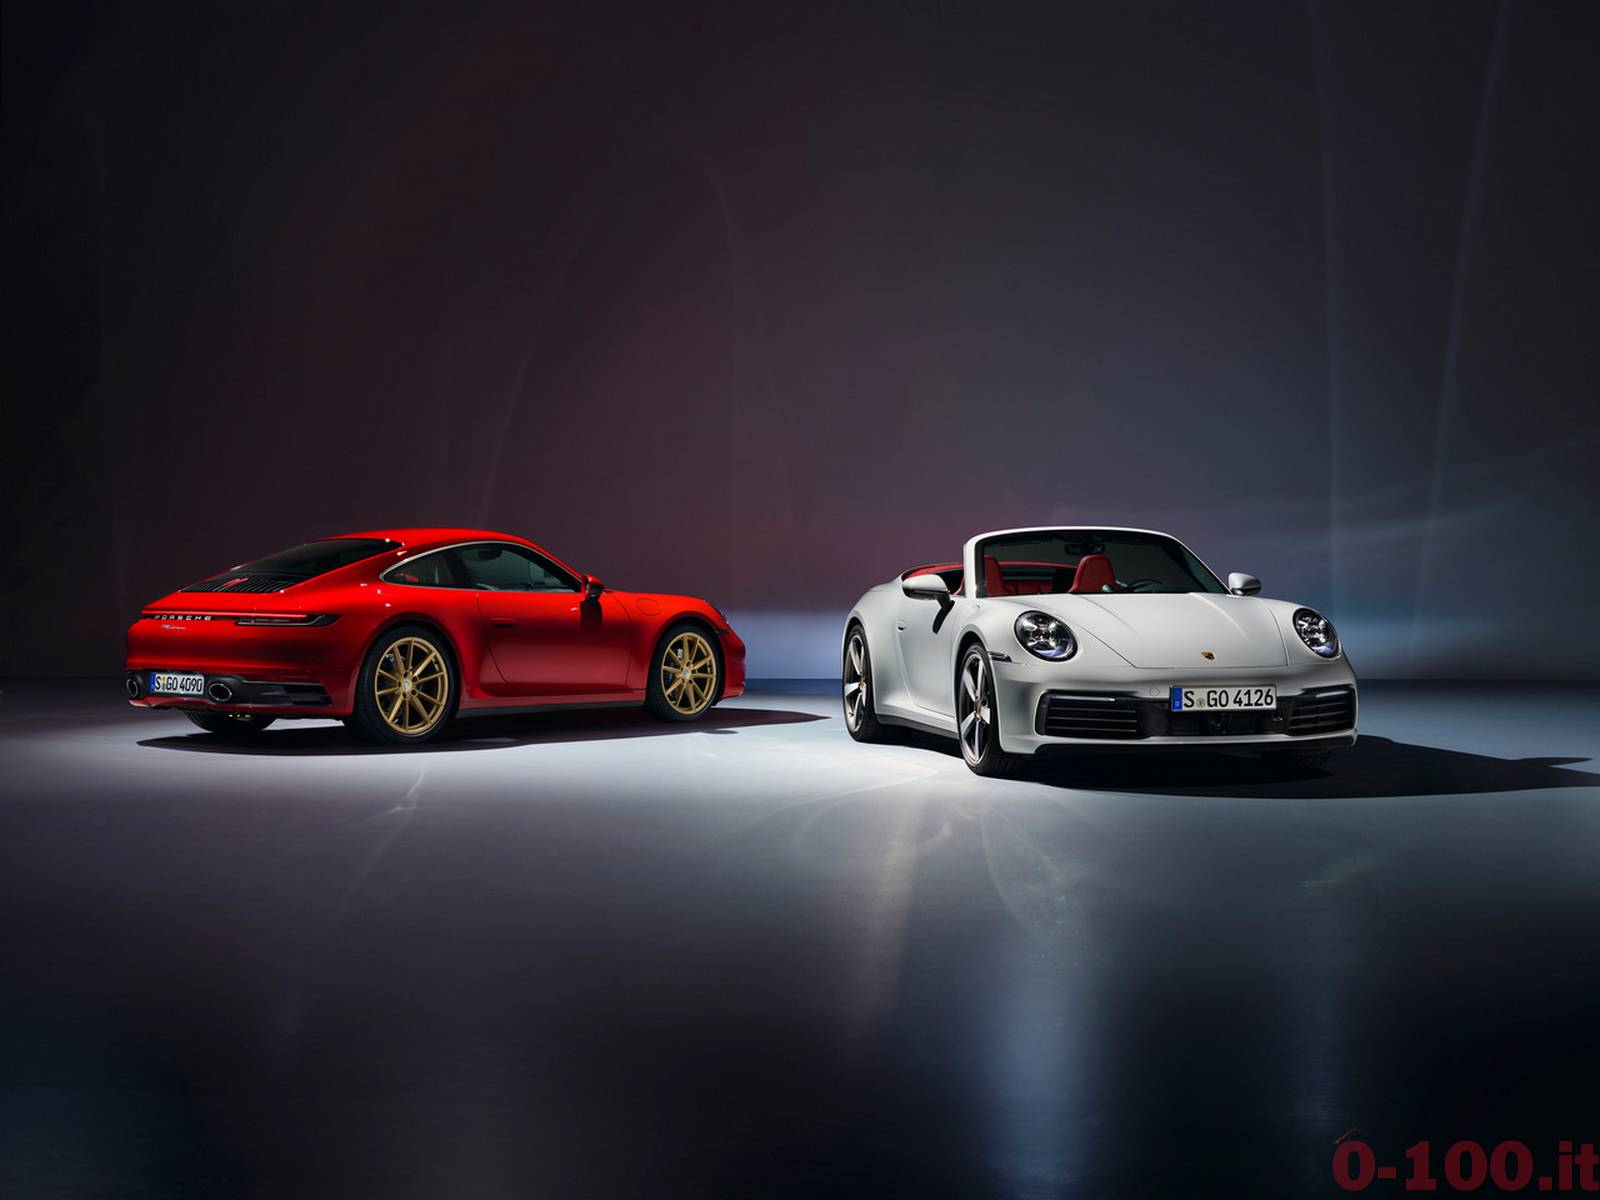 Porsche_992_carrera_coupe_cabriolet_iaa_frankfurt_2019_0-100_13